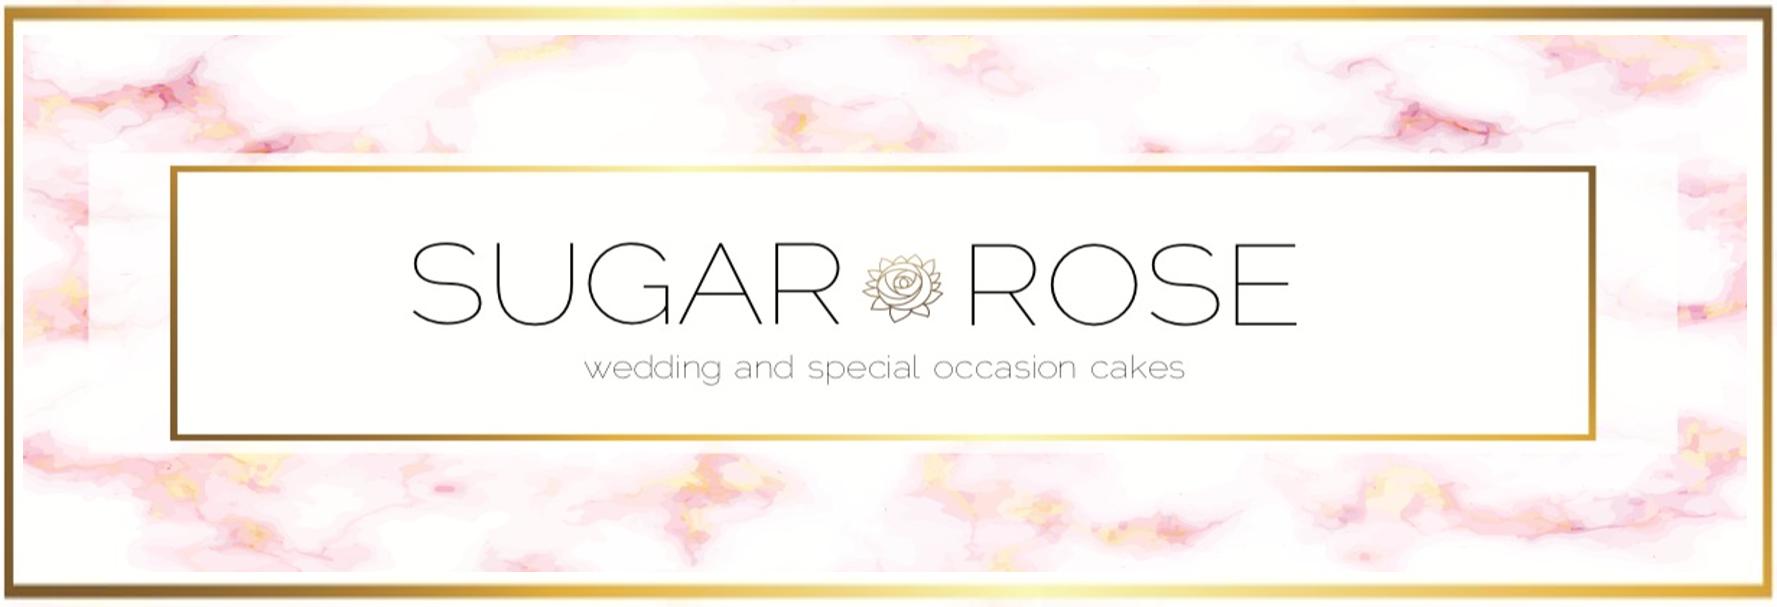 Sugar Rose Cakes